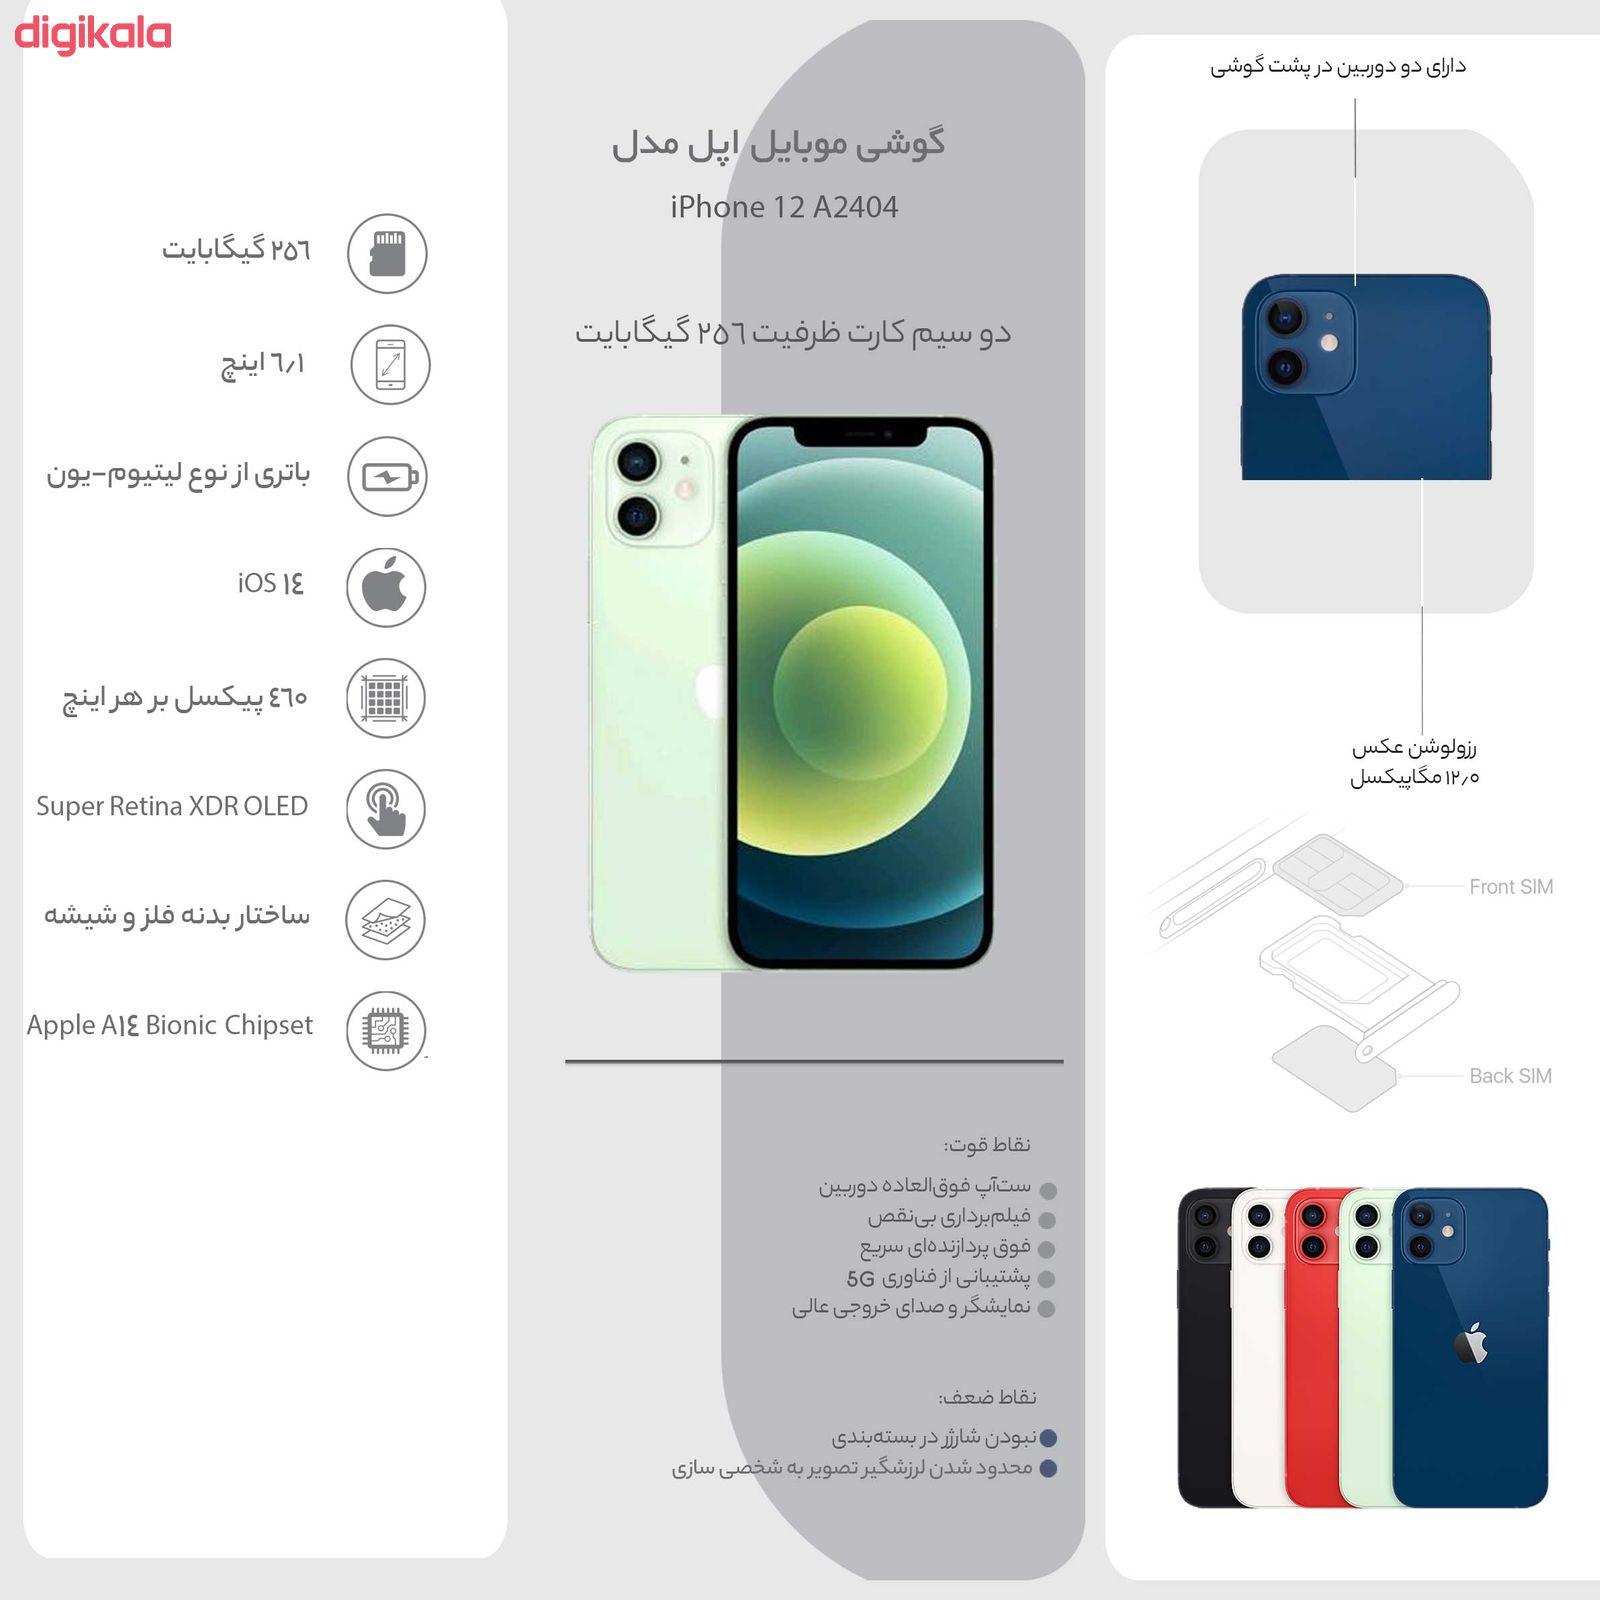 گوشی موبایل اپل مدل iPhone 12 A2404 دو سیم کارت ظرفیت 256 گیگابایت  main 1 4